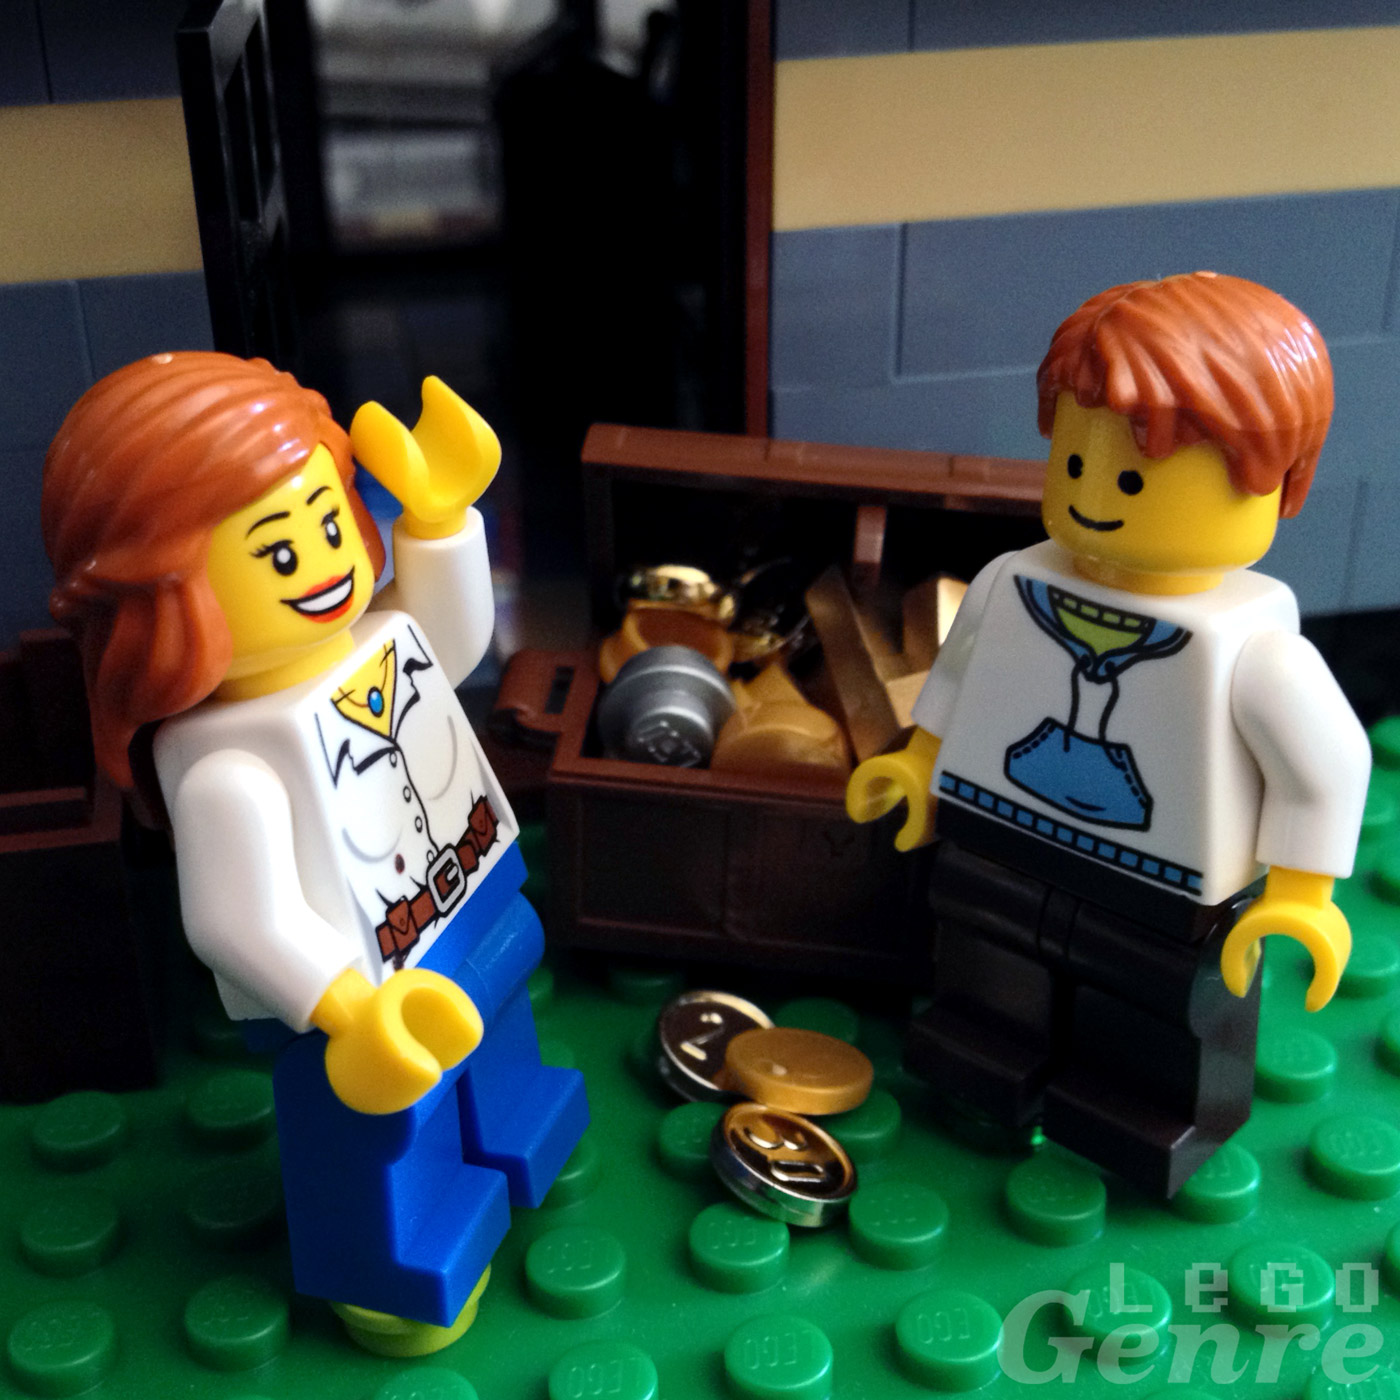 LegoGenre 00378: Mother's Day Surprise